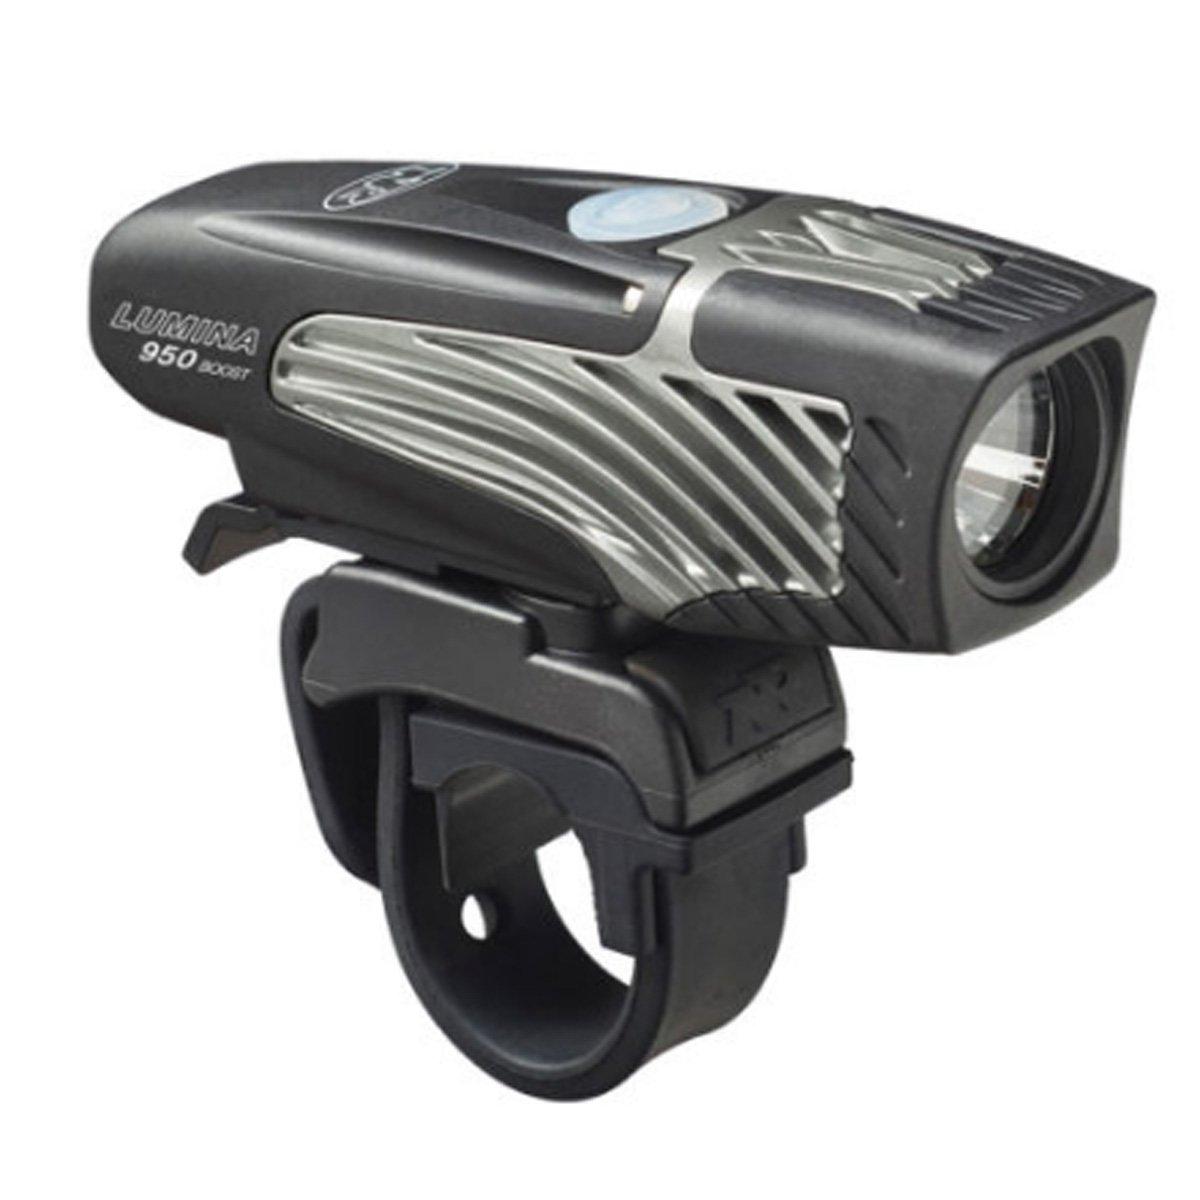 NiteRider Lumina 950 Boost Bike Light